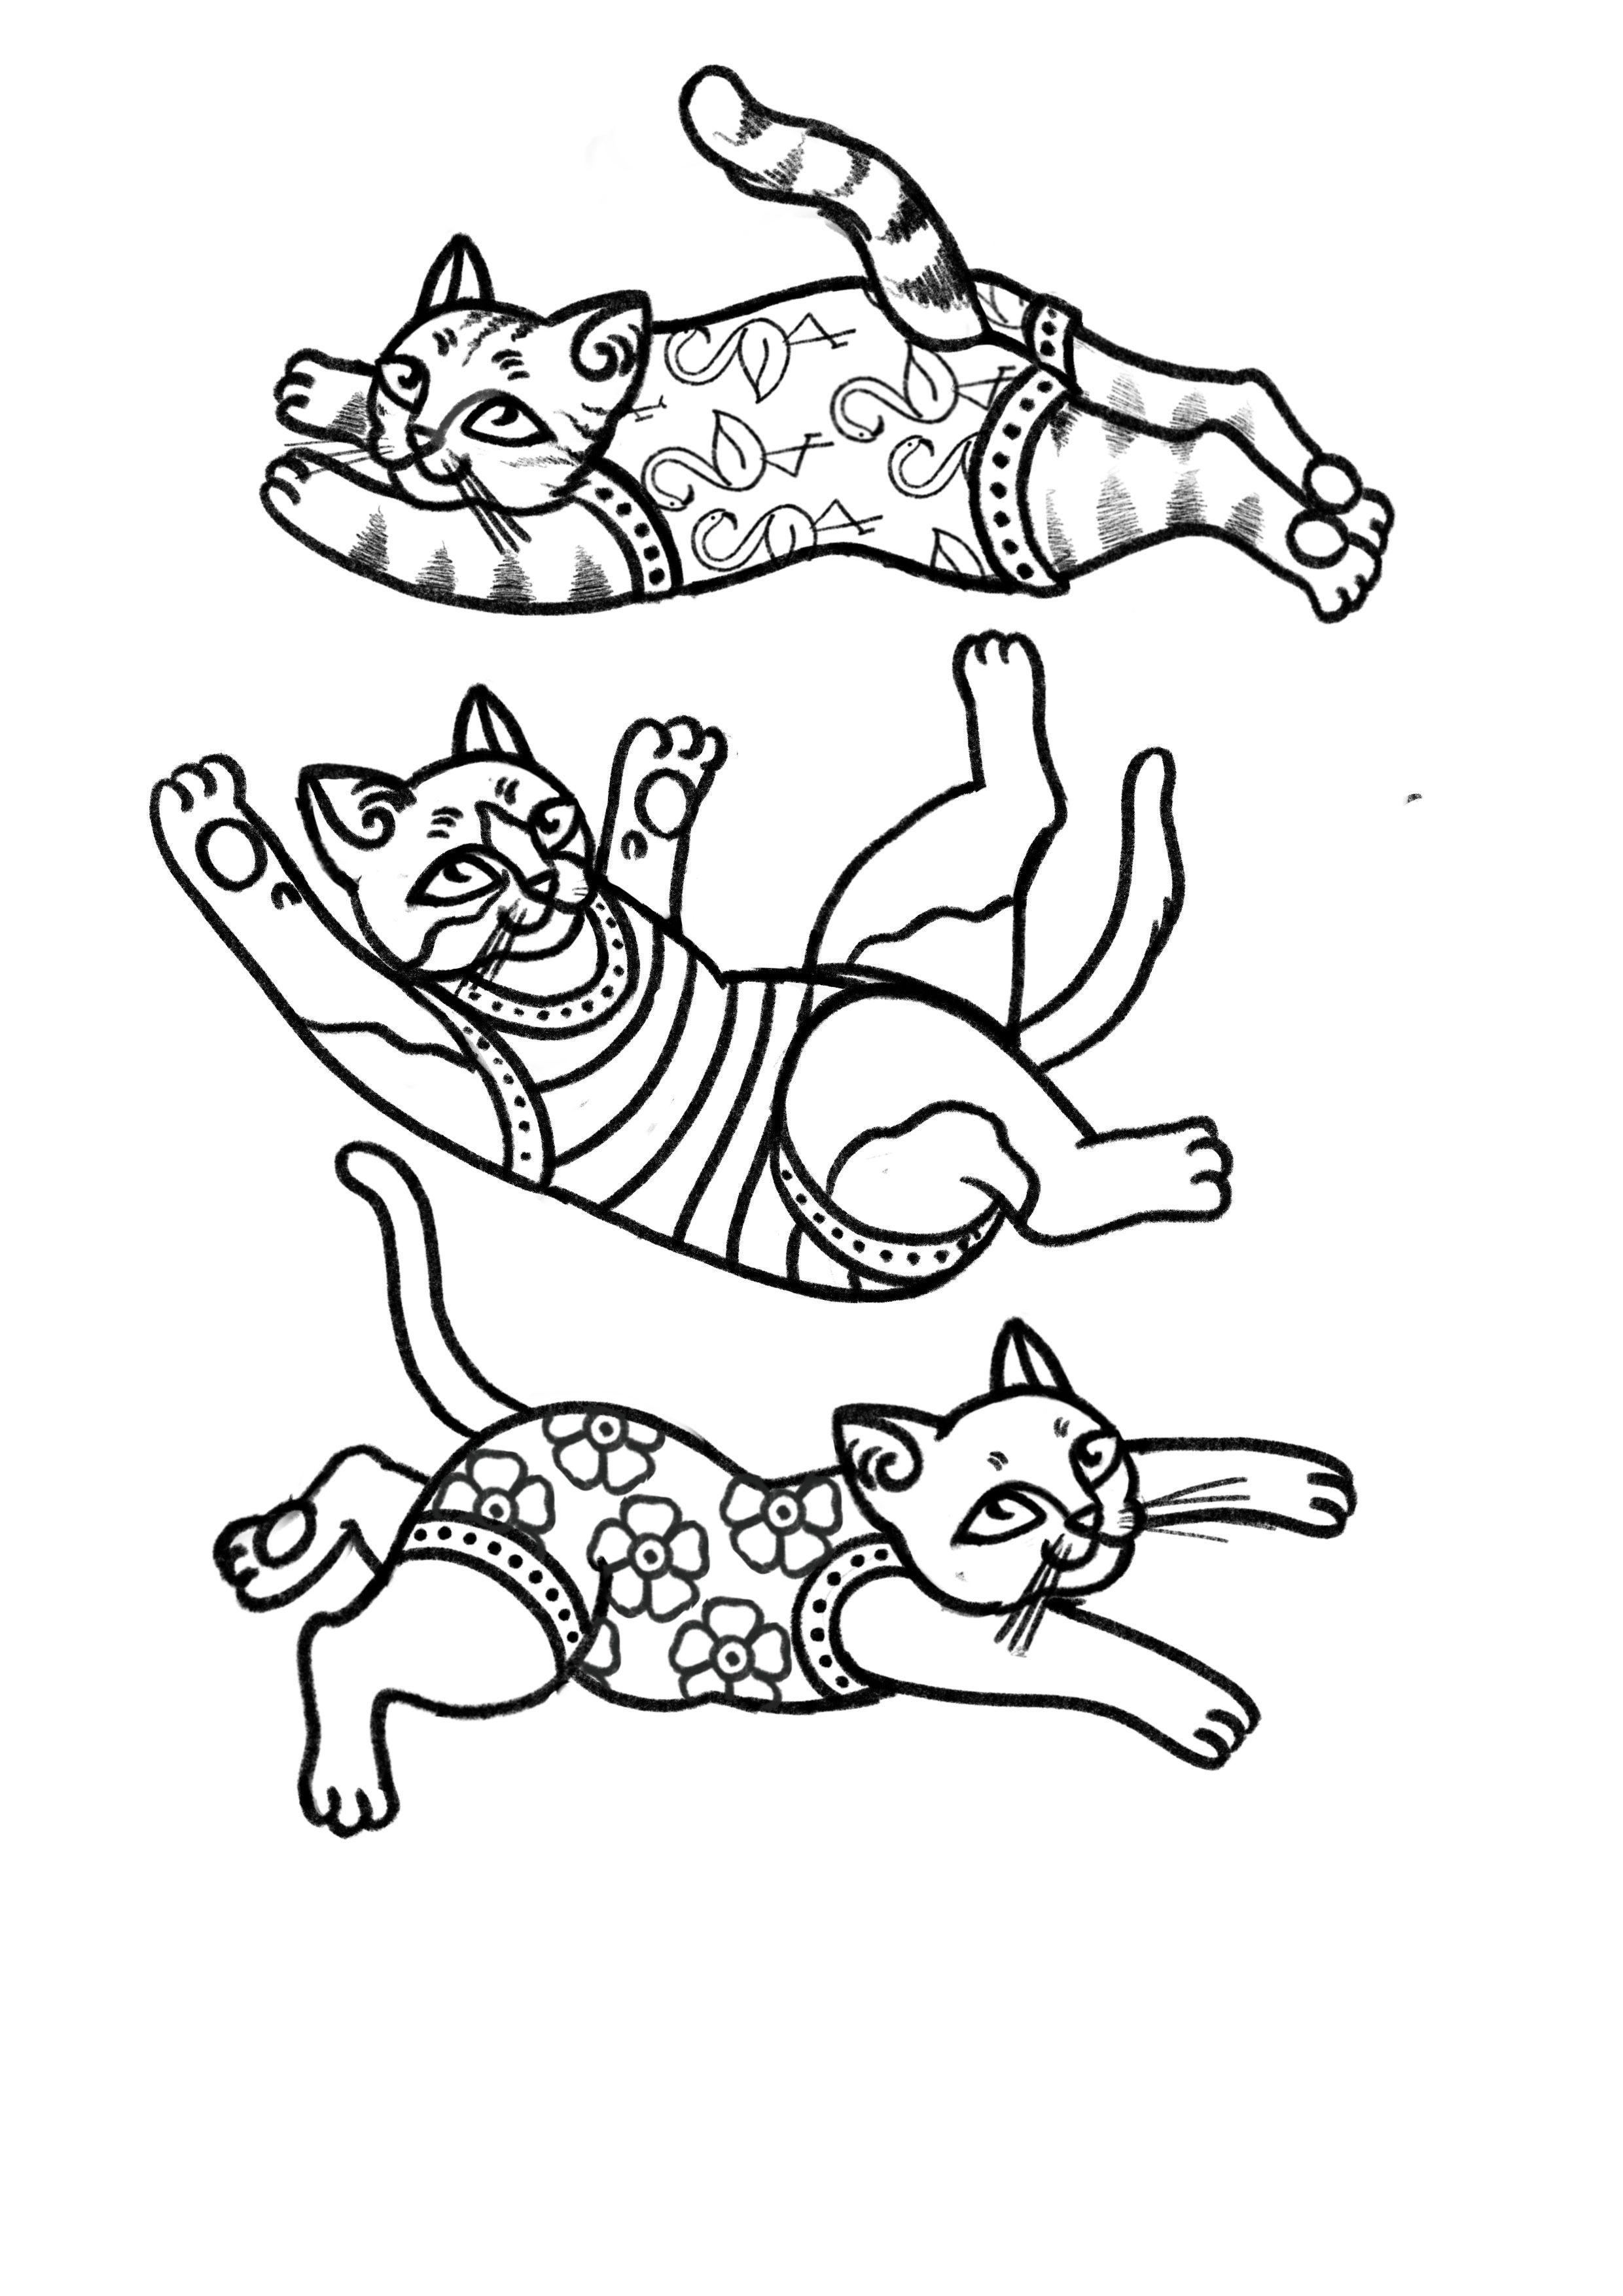 Pin De Joni Knapp Em American Traditional Tattoo Desenhos Para